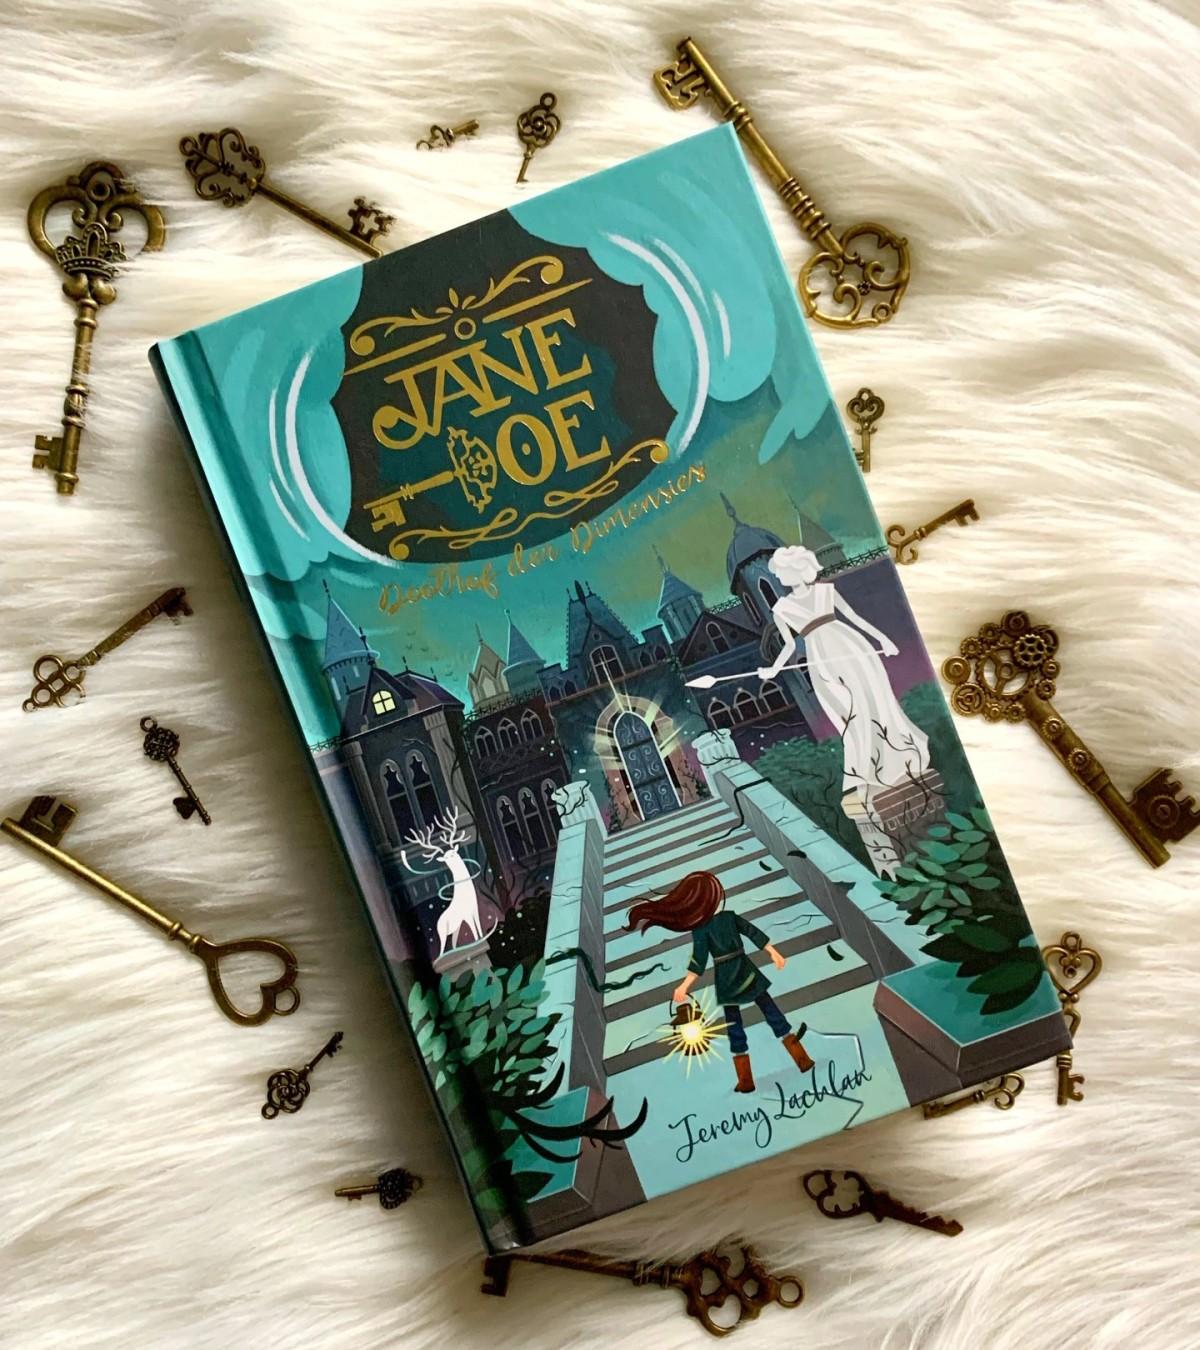 Jane Doe: Doolhof der dimensies – JeremyLachlan